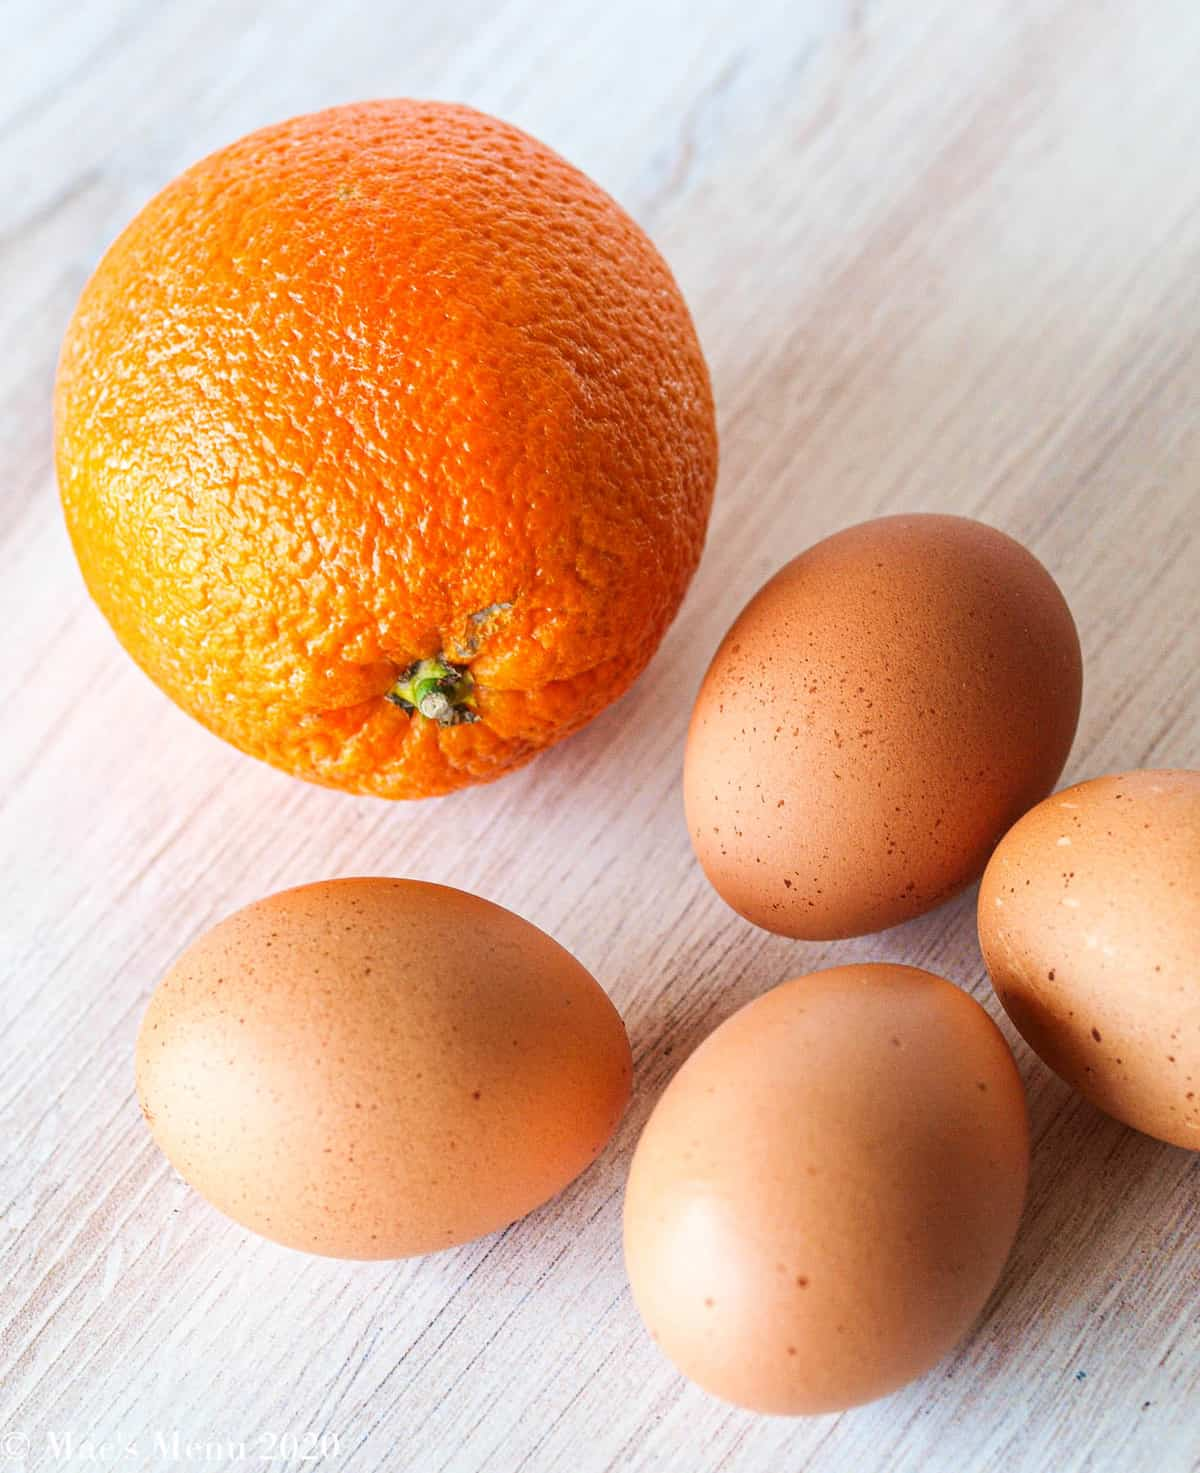 An orange next to 4 large brown eggs